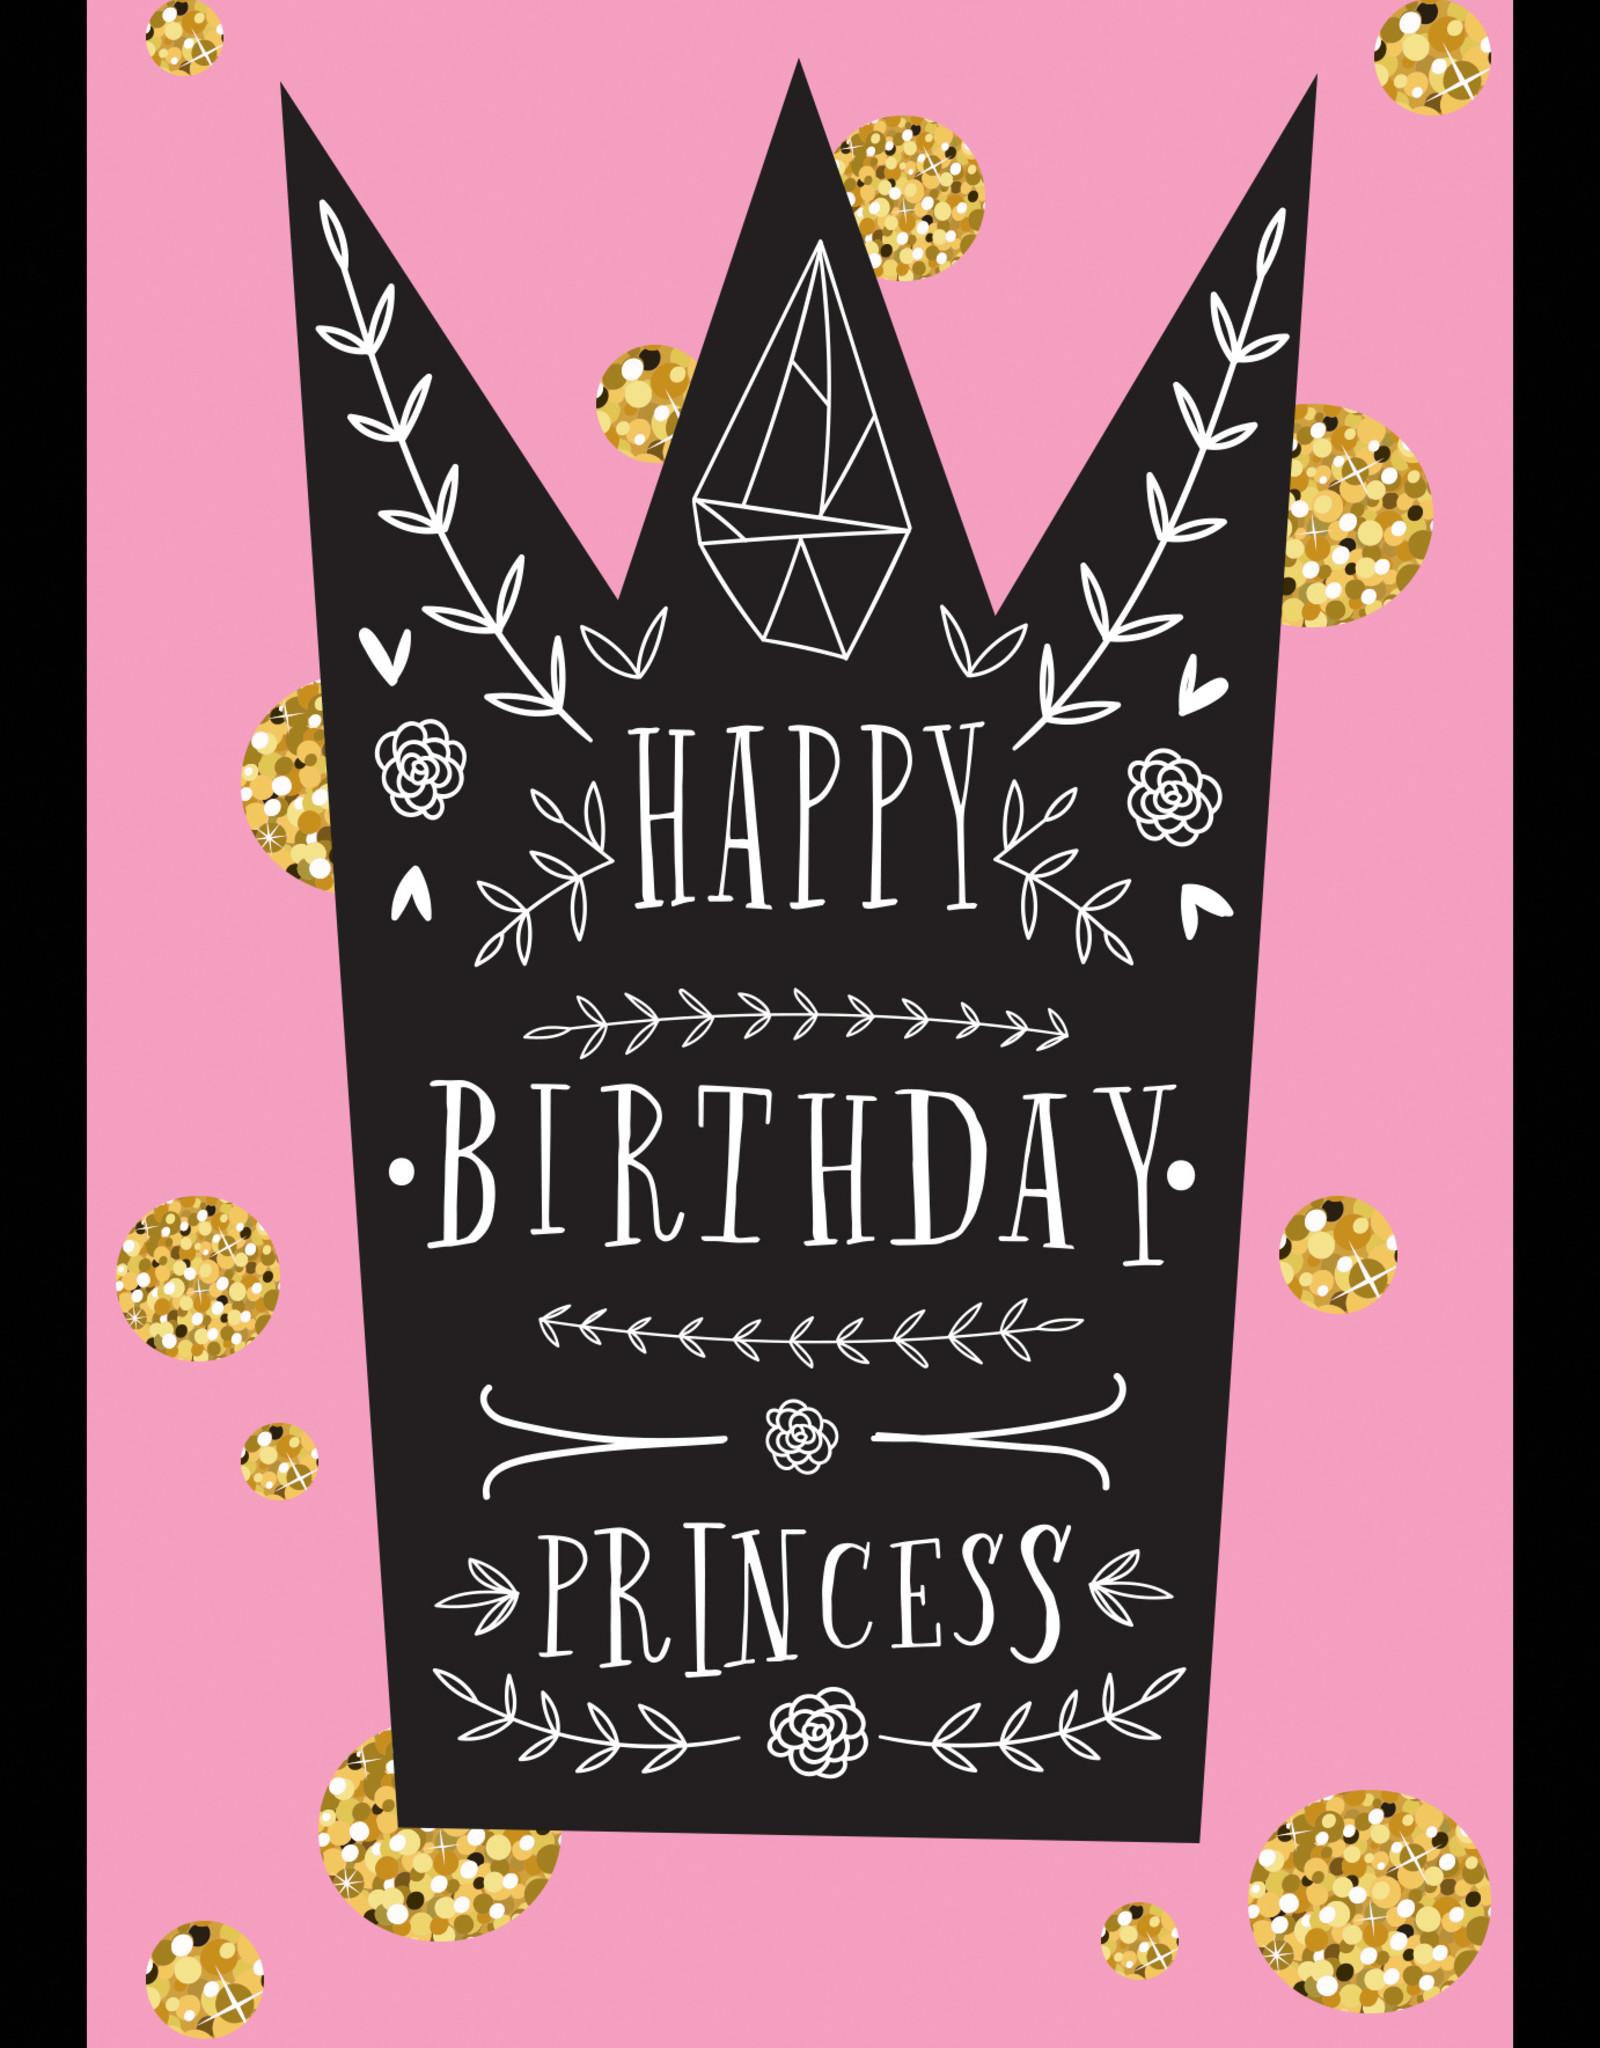 Pictura Pictura - Daughter Birthday Card 60111